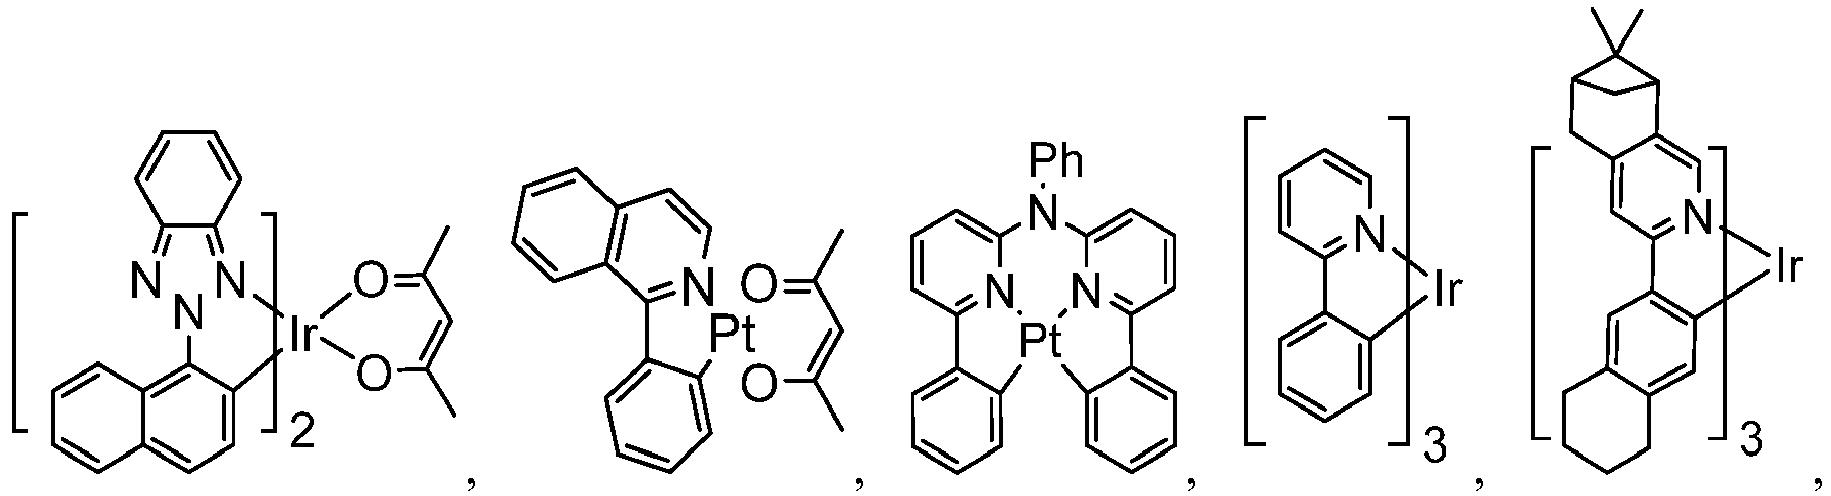 Figure imgb0911